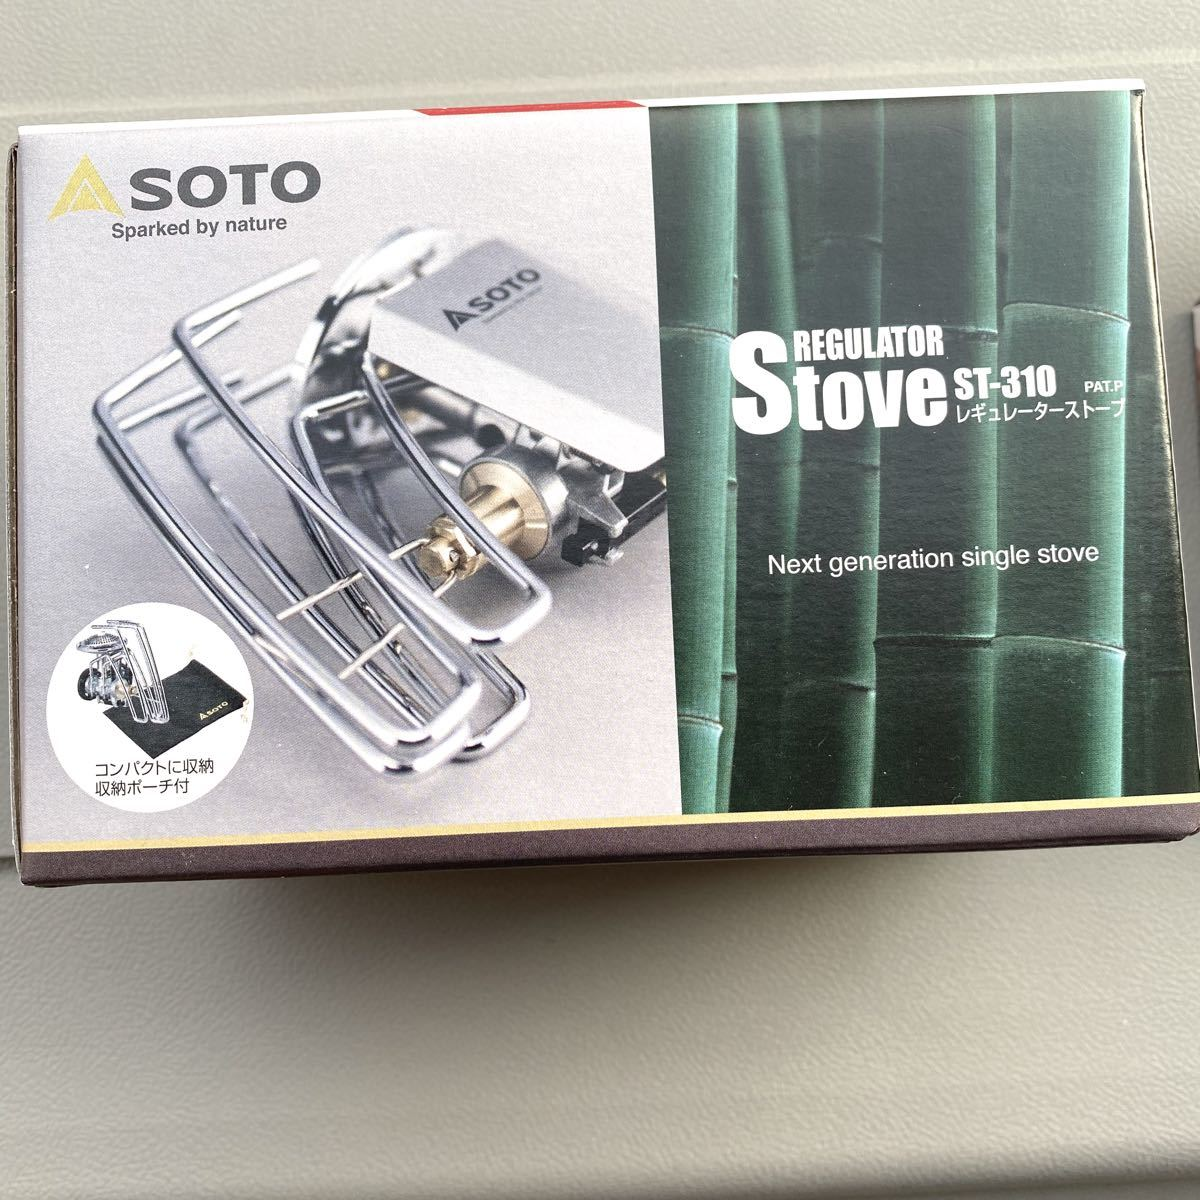 SOTO レギュレーターストーブ ST-310 新富士バーナー 新品未開封